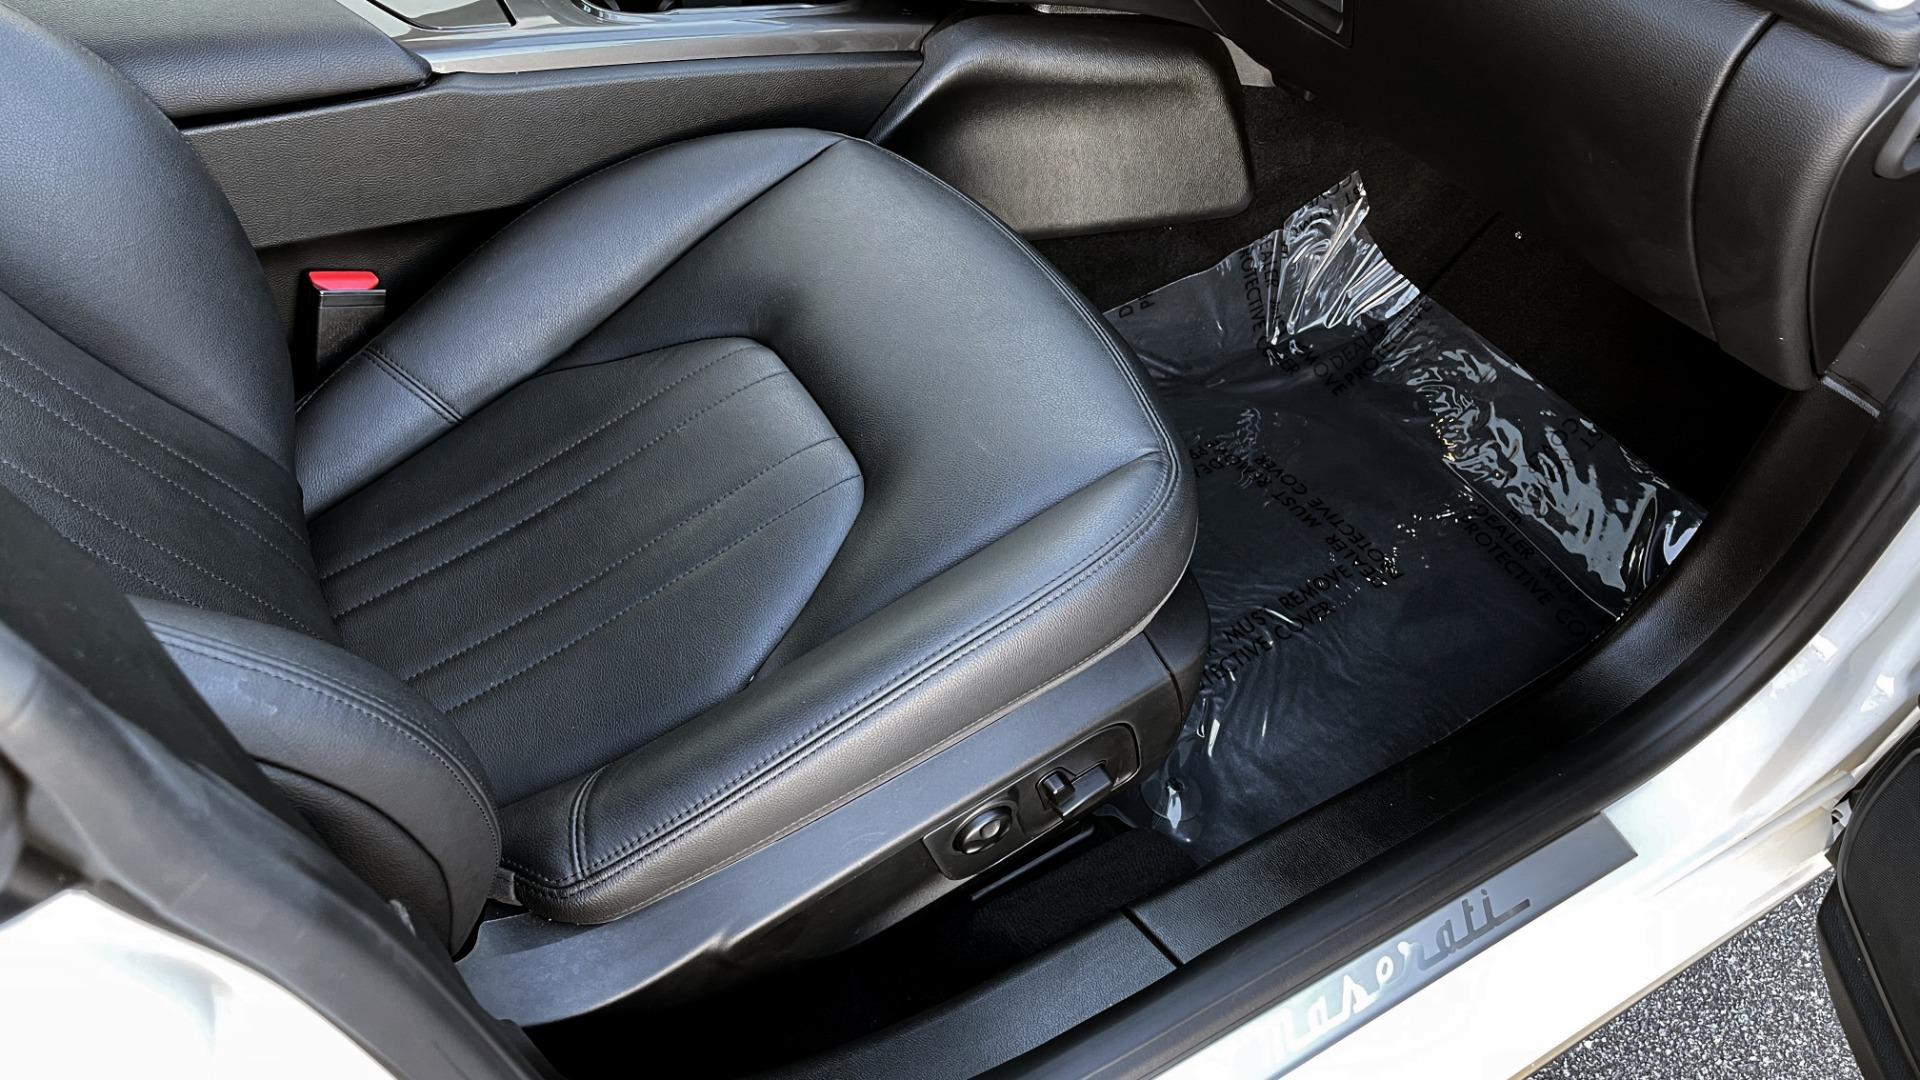 Used 2018 Maserati GHIBLI SEDAN / RWD / 3.0L V6 / SUNROOF / NAV / REARVIEW for sale $42,995 at Formula Imports in Charlotte NC 28227 58